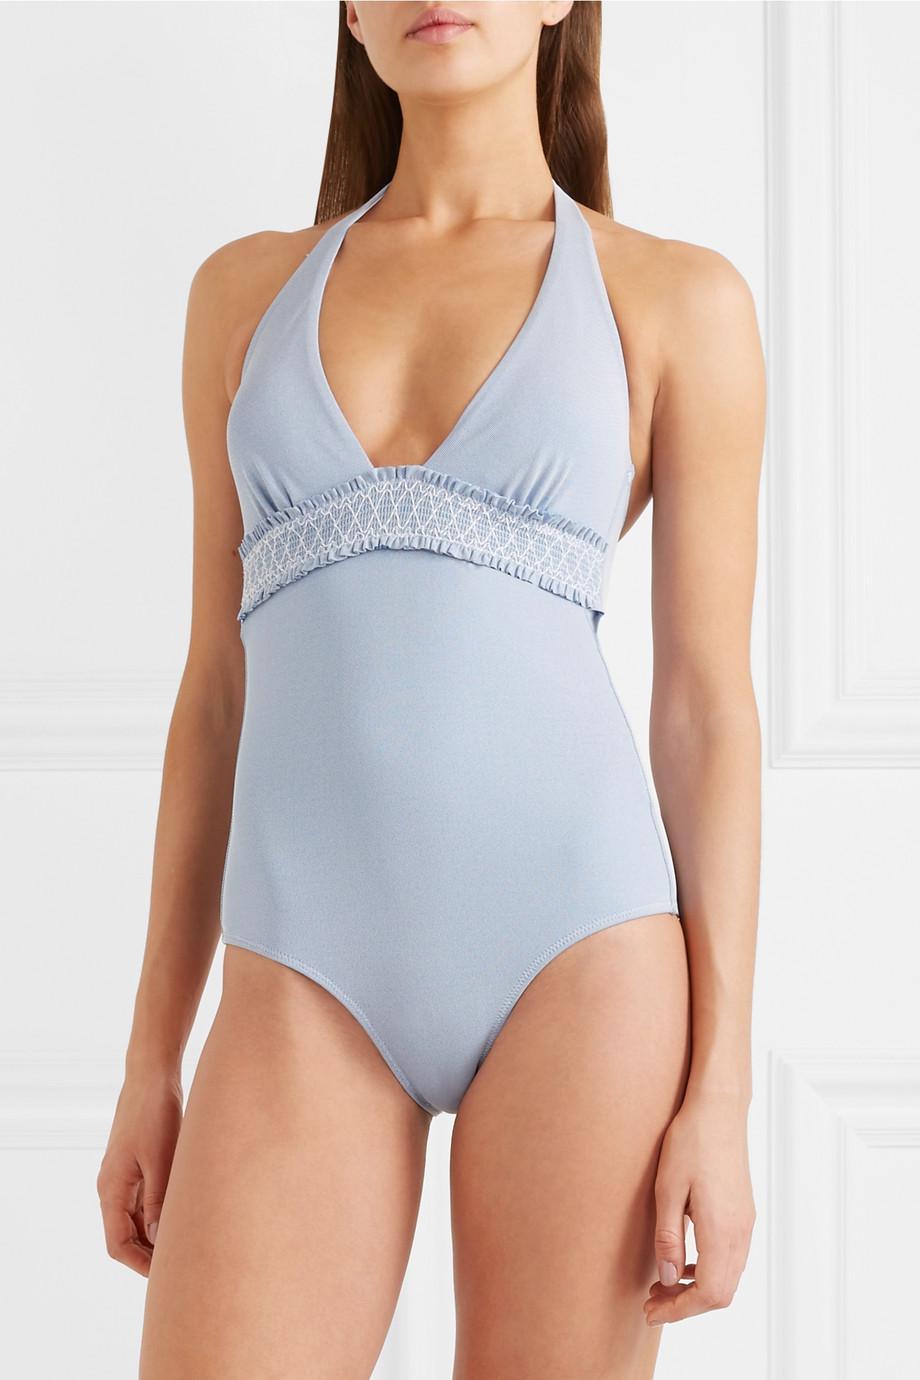 Sale Outlet Cassis Smocked Stretch-piqué Bikini Briefs - Light blue Heidi Klein Affordable Sale New Styles FTHbsUcbG